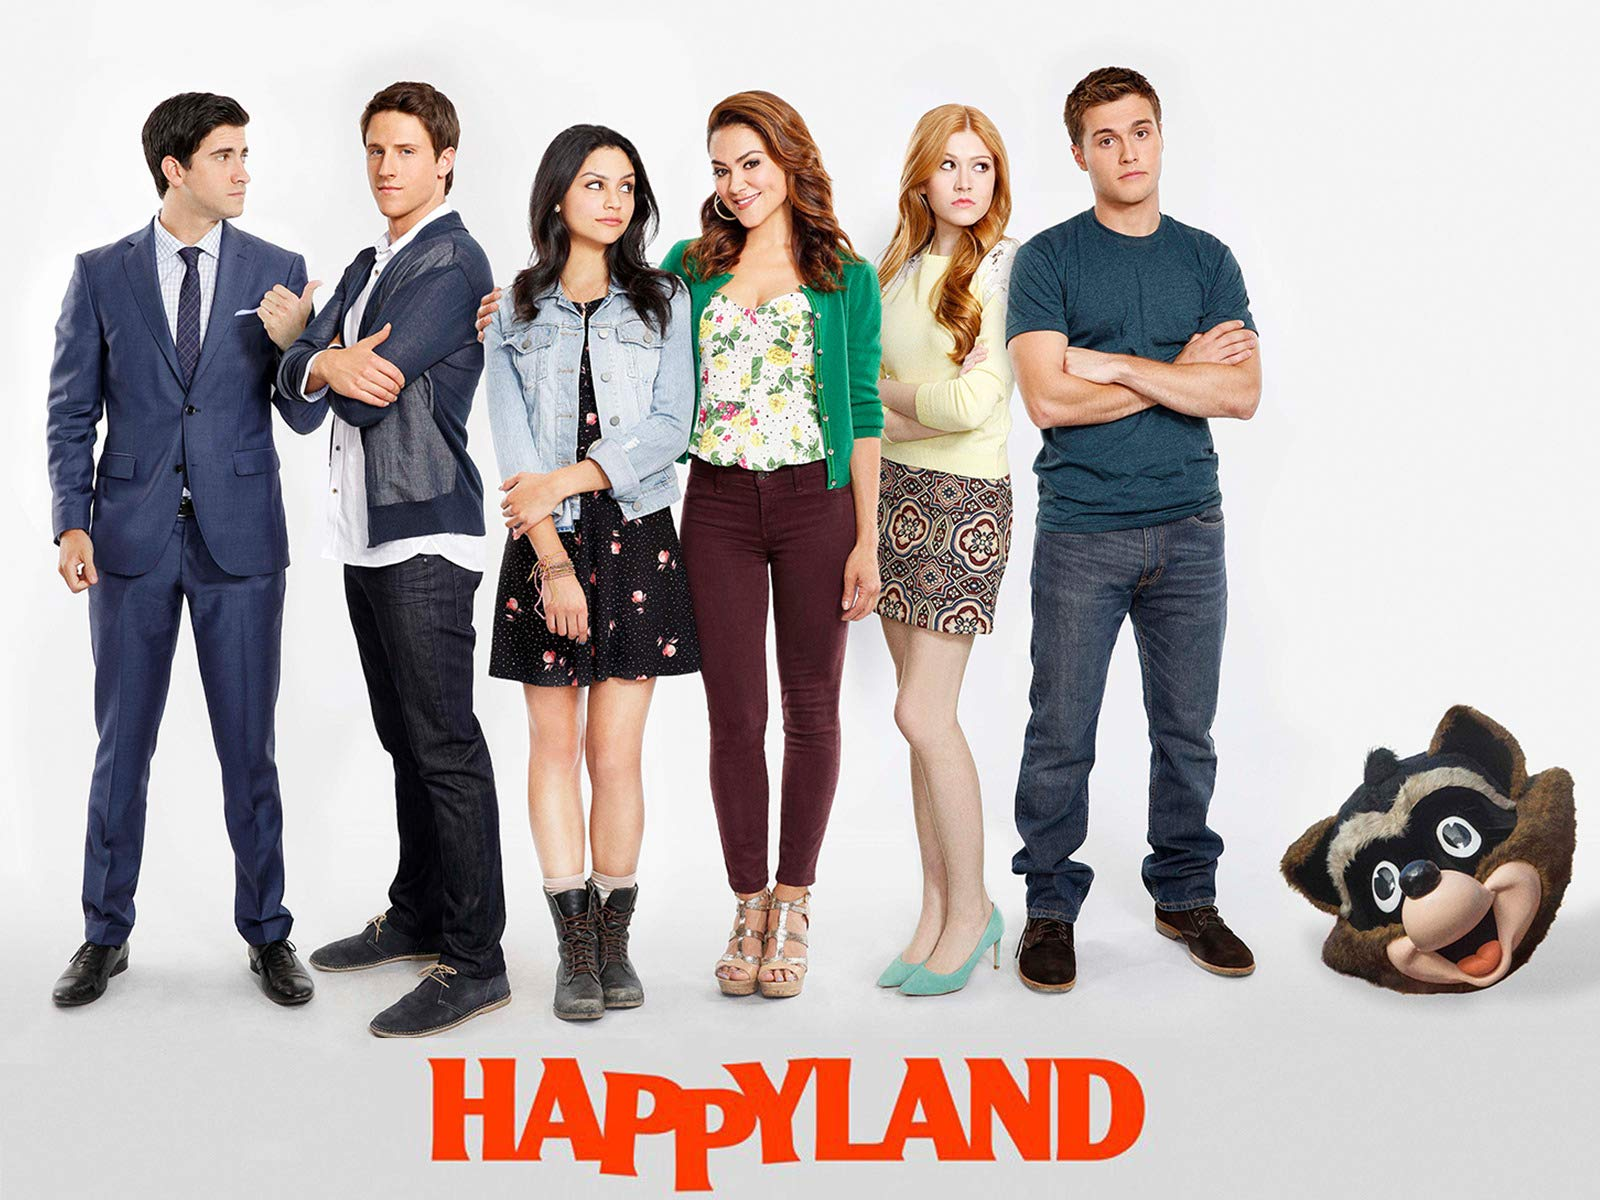 Happyland - Season 1